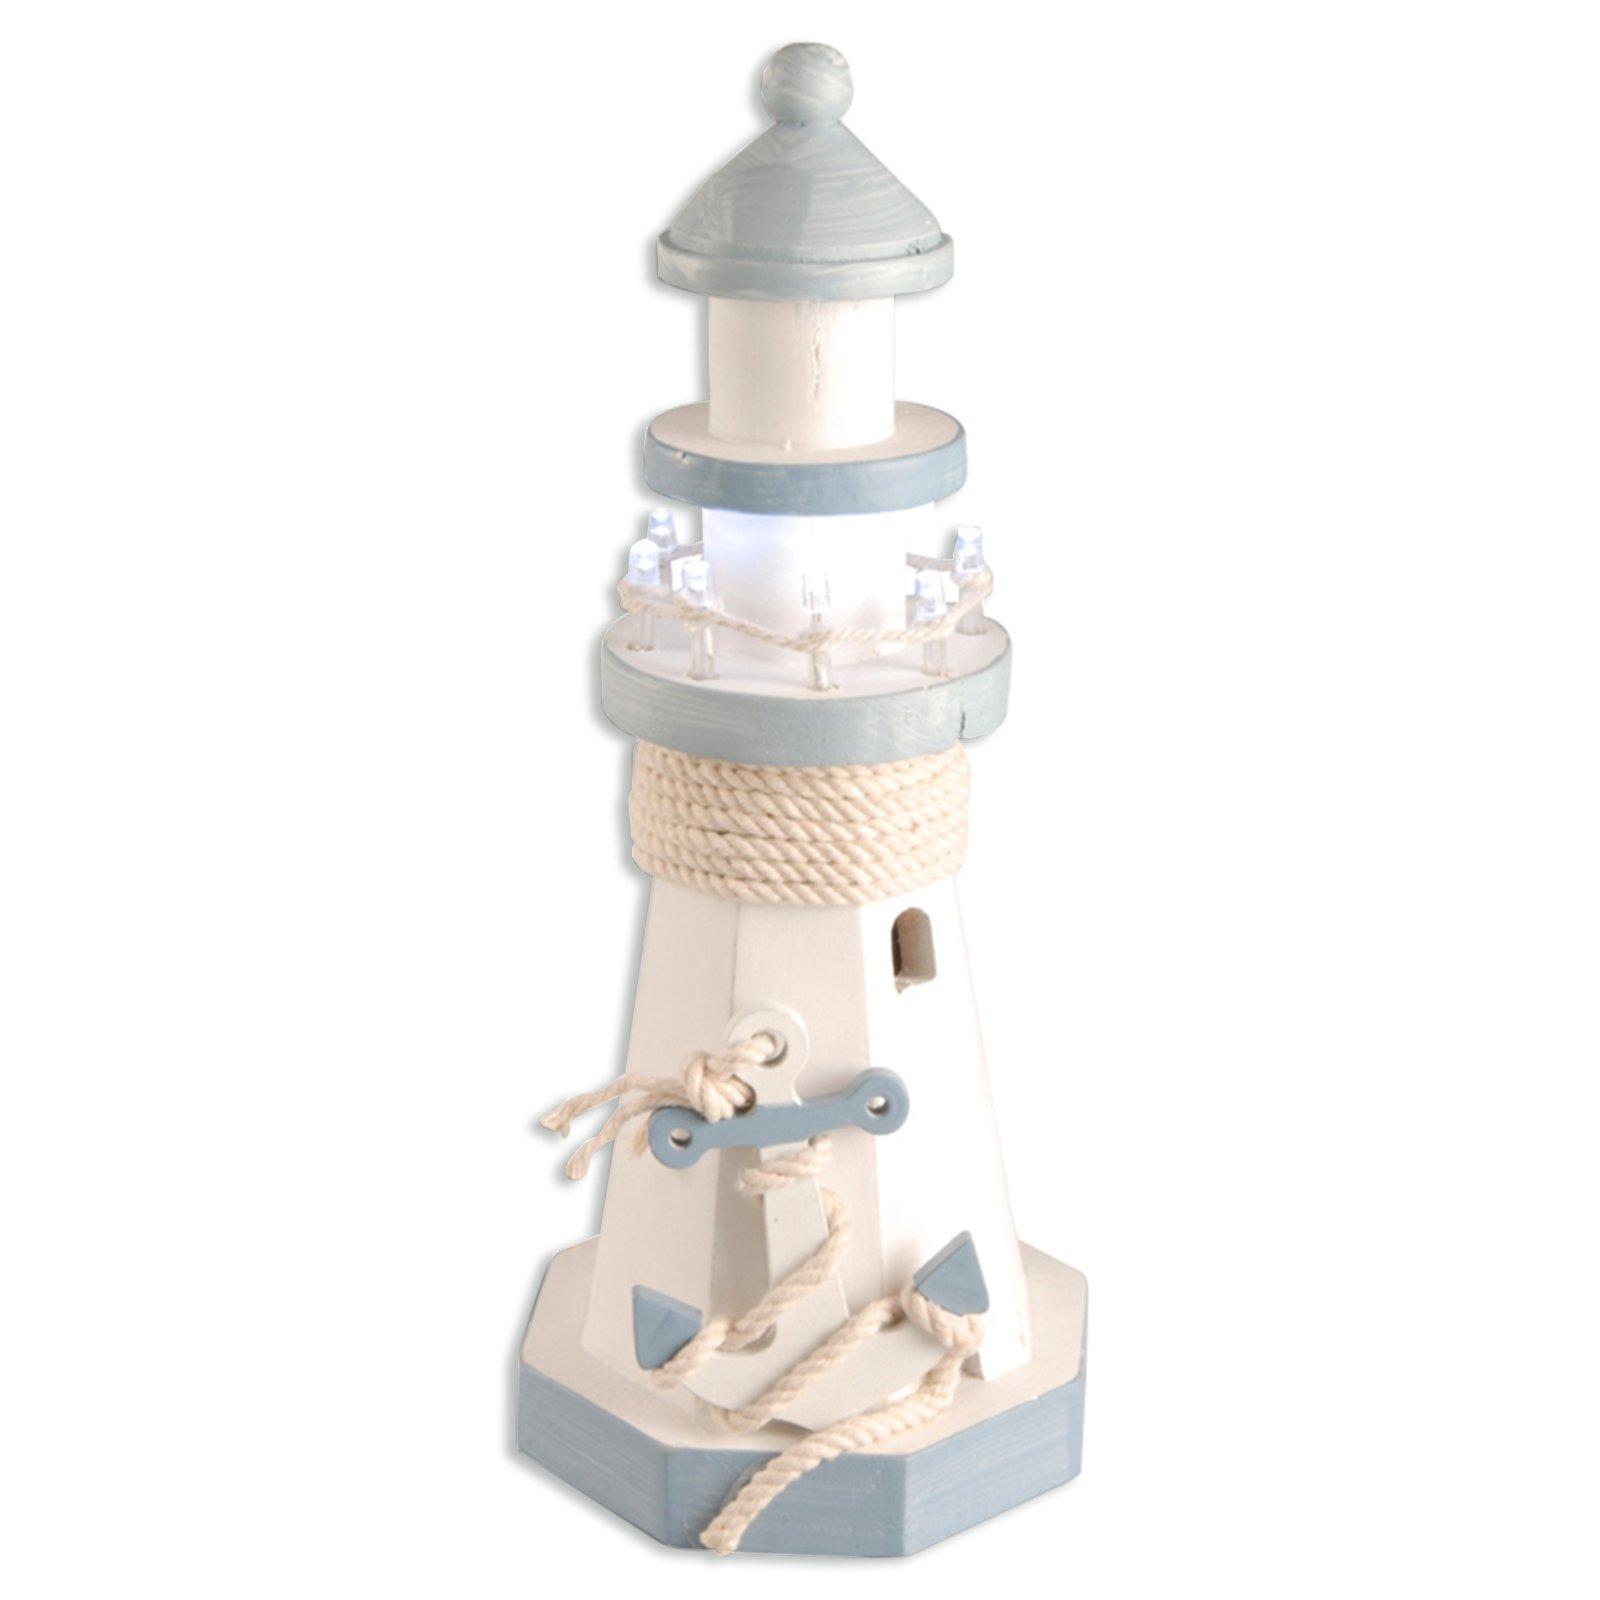 LED-Leuchtturm - Kiefer - weiß-blau - 25 cm hoch | ROLLER Möbelhaus